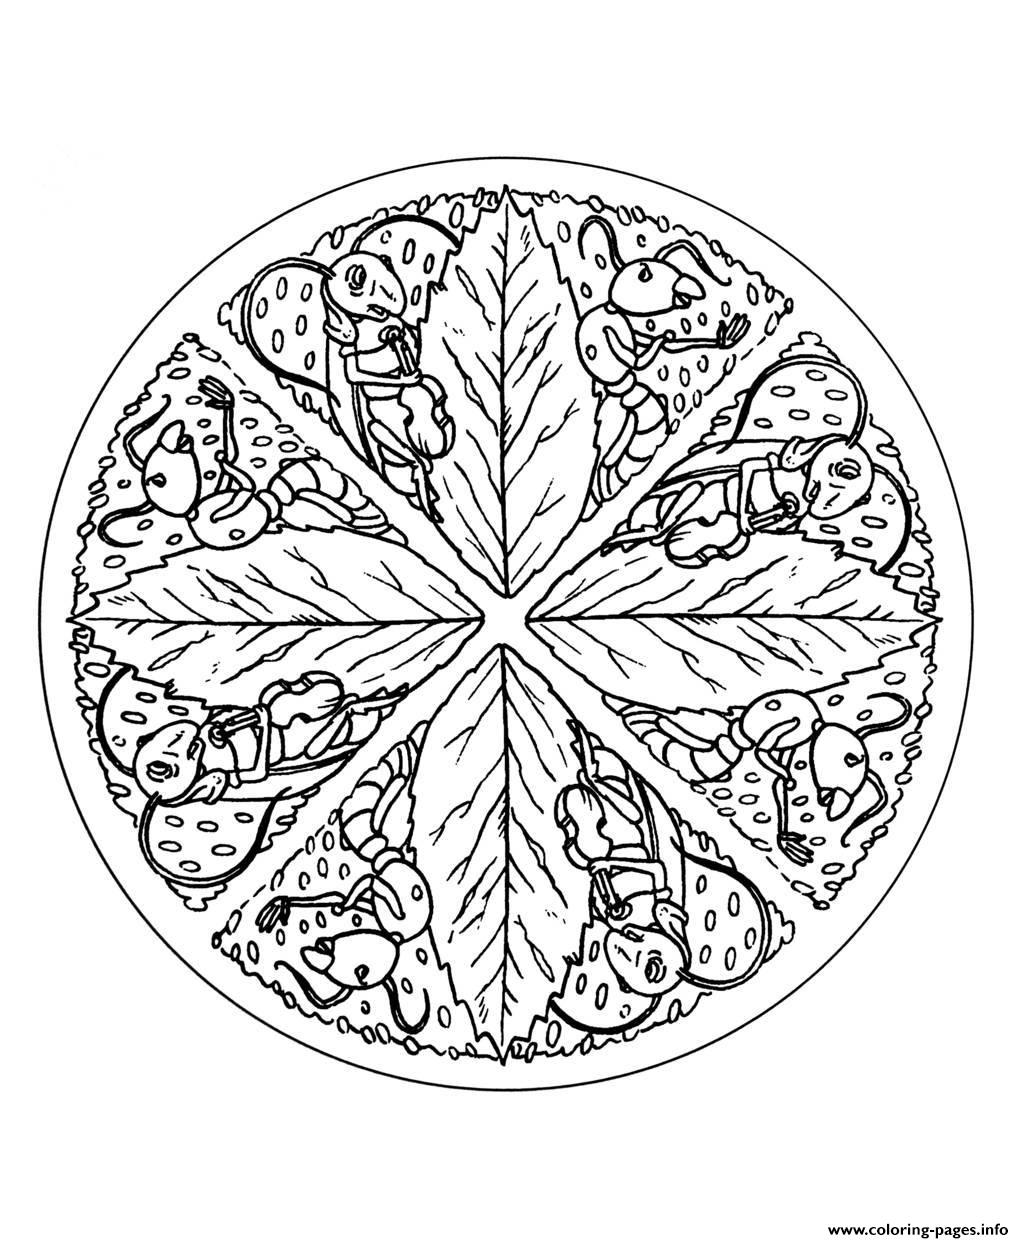 Volwassen Kleurplaten En Mandalas Free Mandala To Color Leaves Coloring Pages Printable